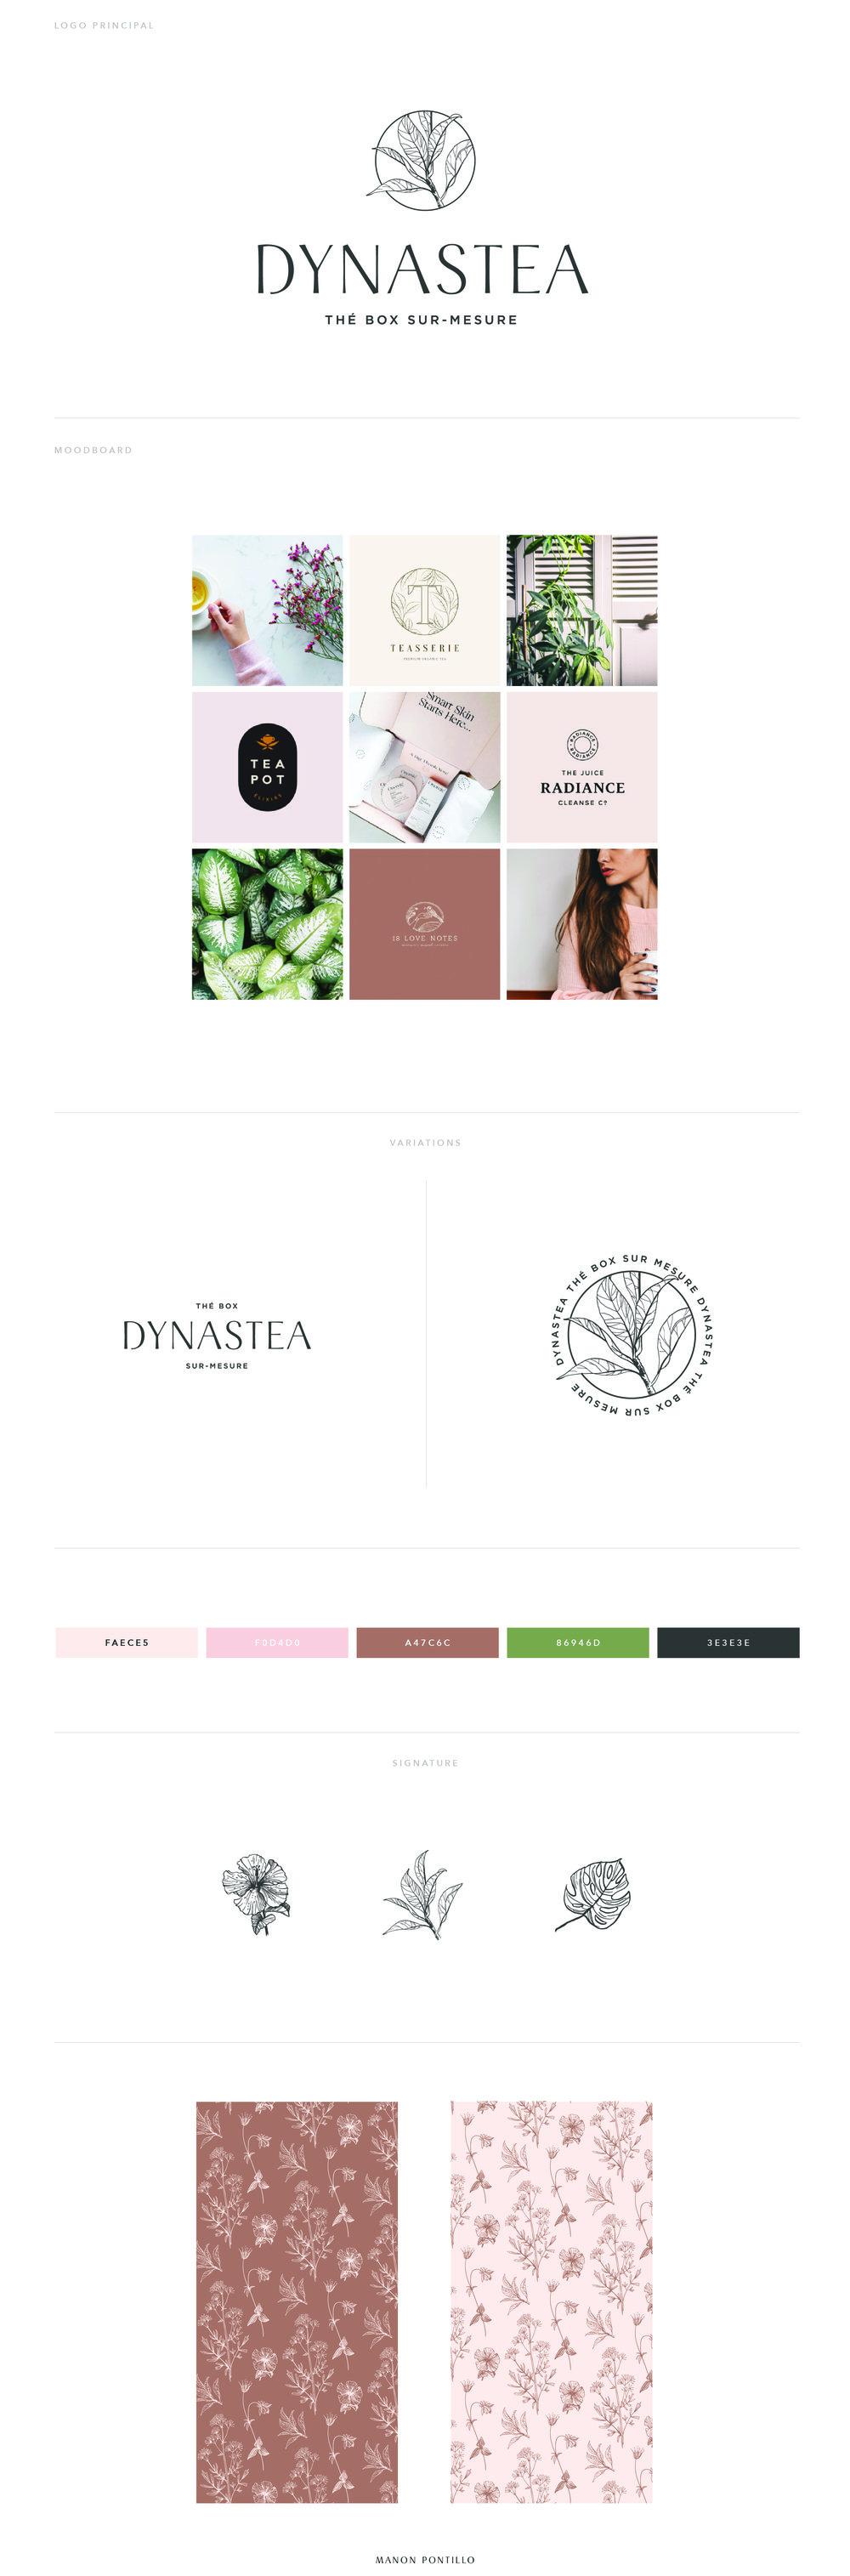 DynasteaBox-BrandBoard.jpg